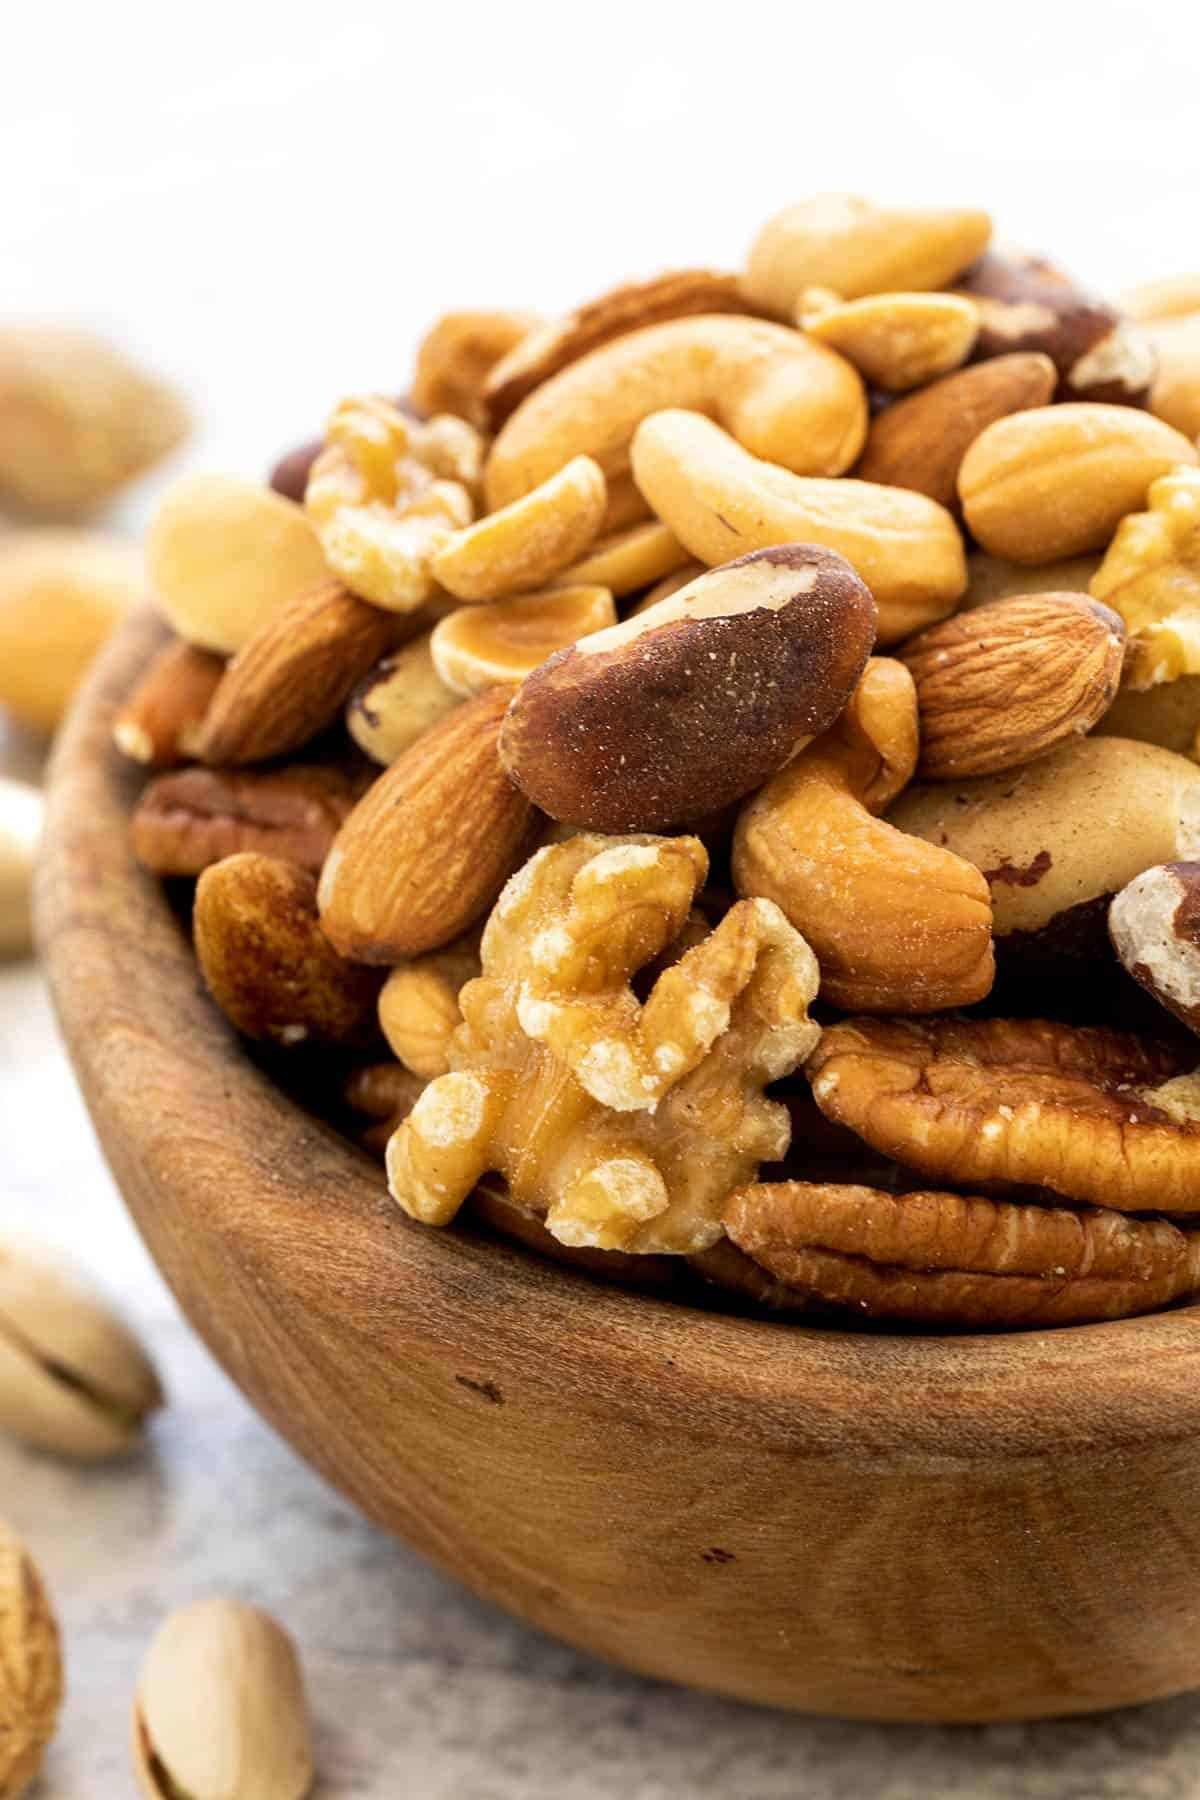 5 Health Benefits Of Nuts Jessica Gavin Food Allergies Usda Food Allergic Reaction To Food